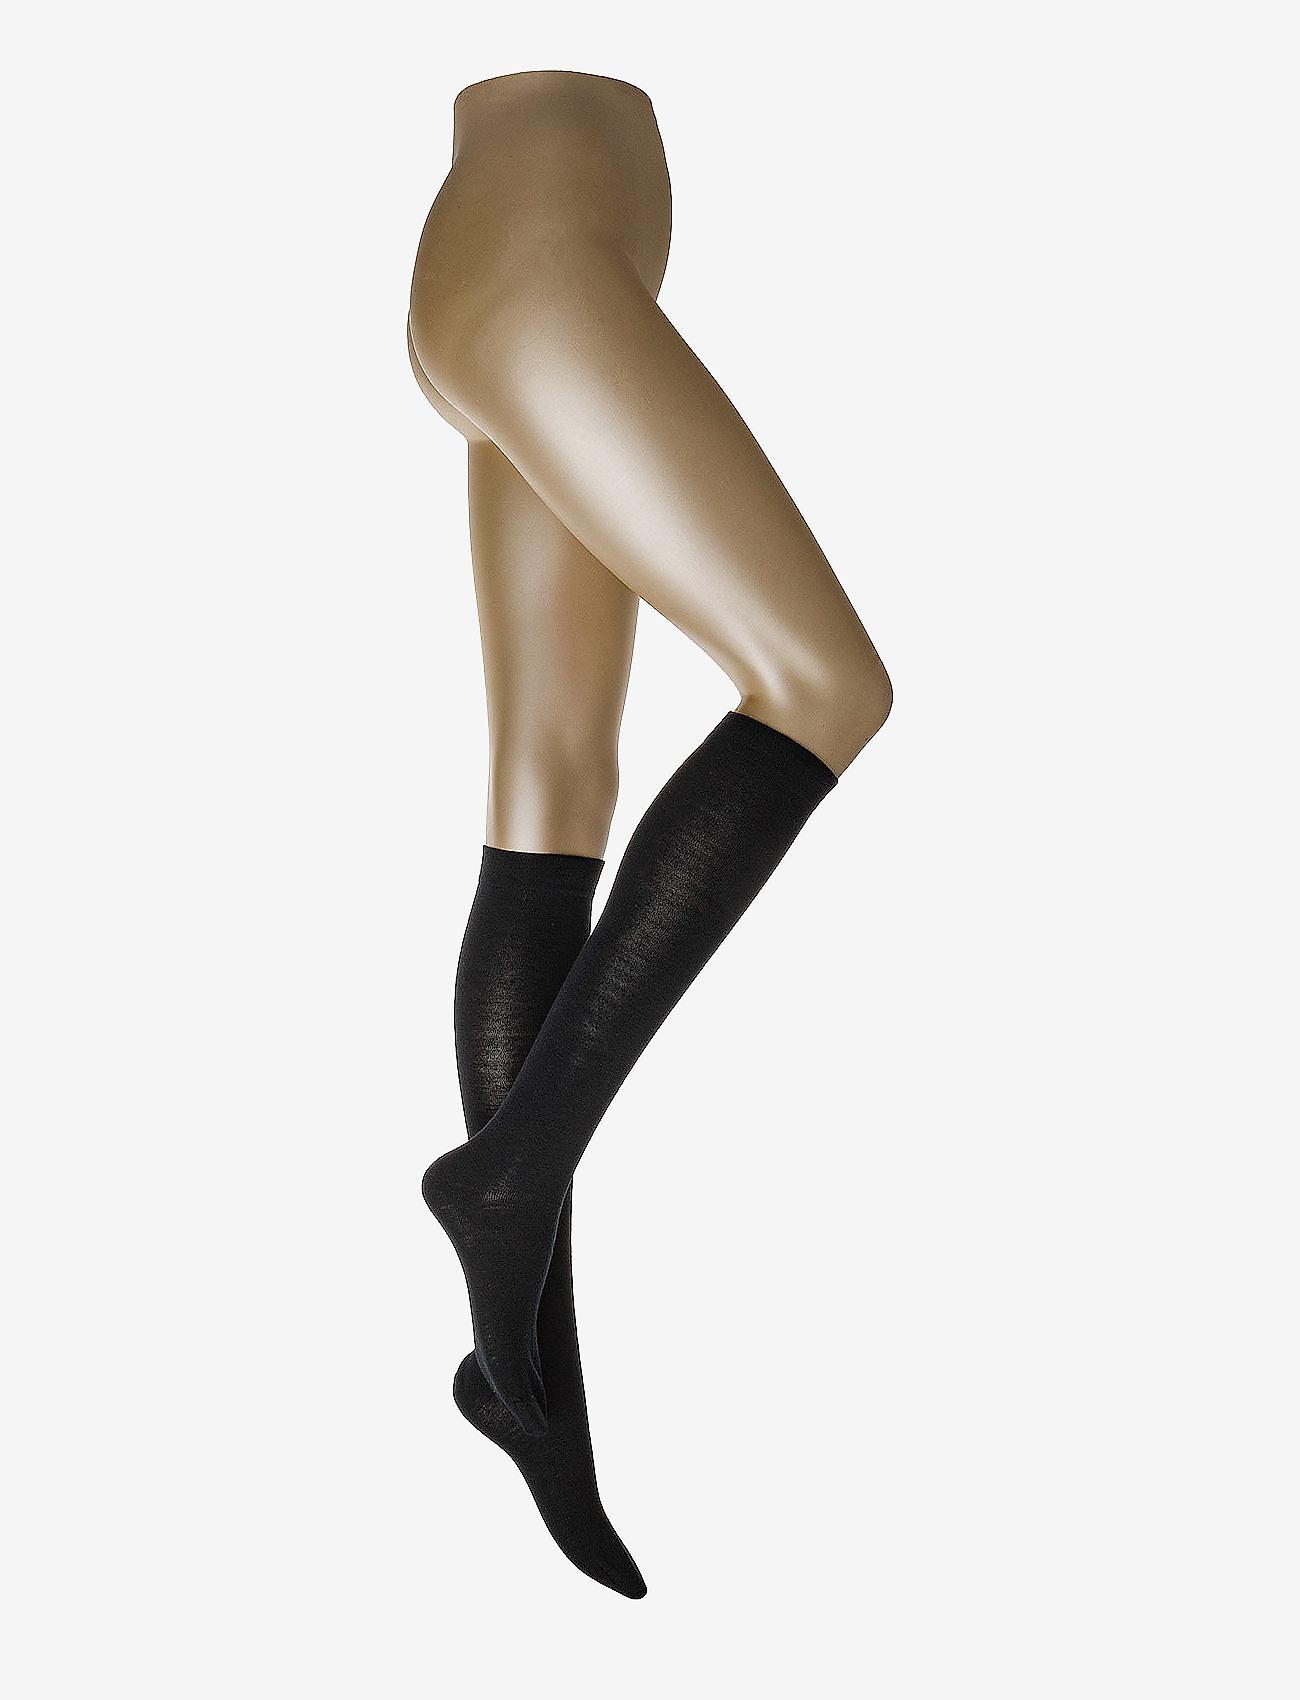 Decoy - Wool, Double Face kneehigh - kolanówki - black - 0